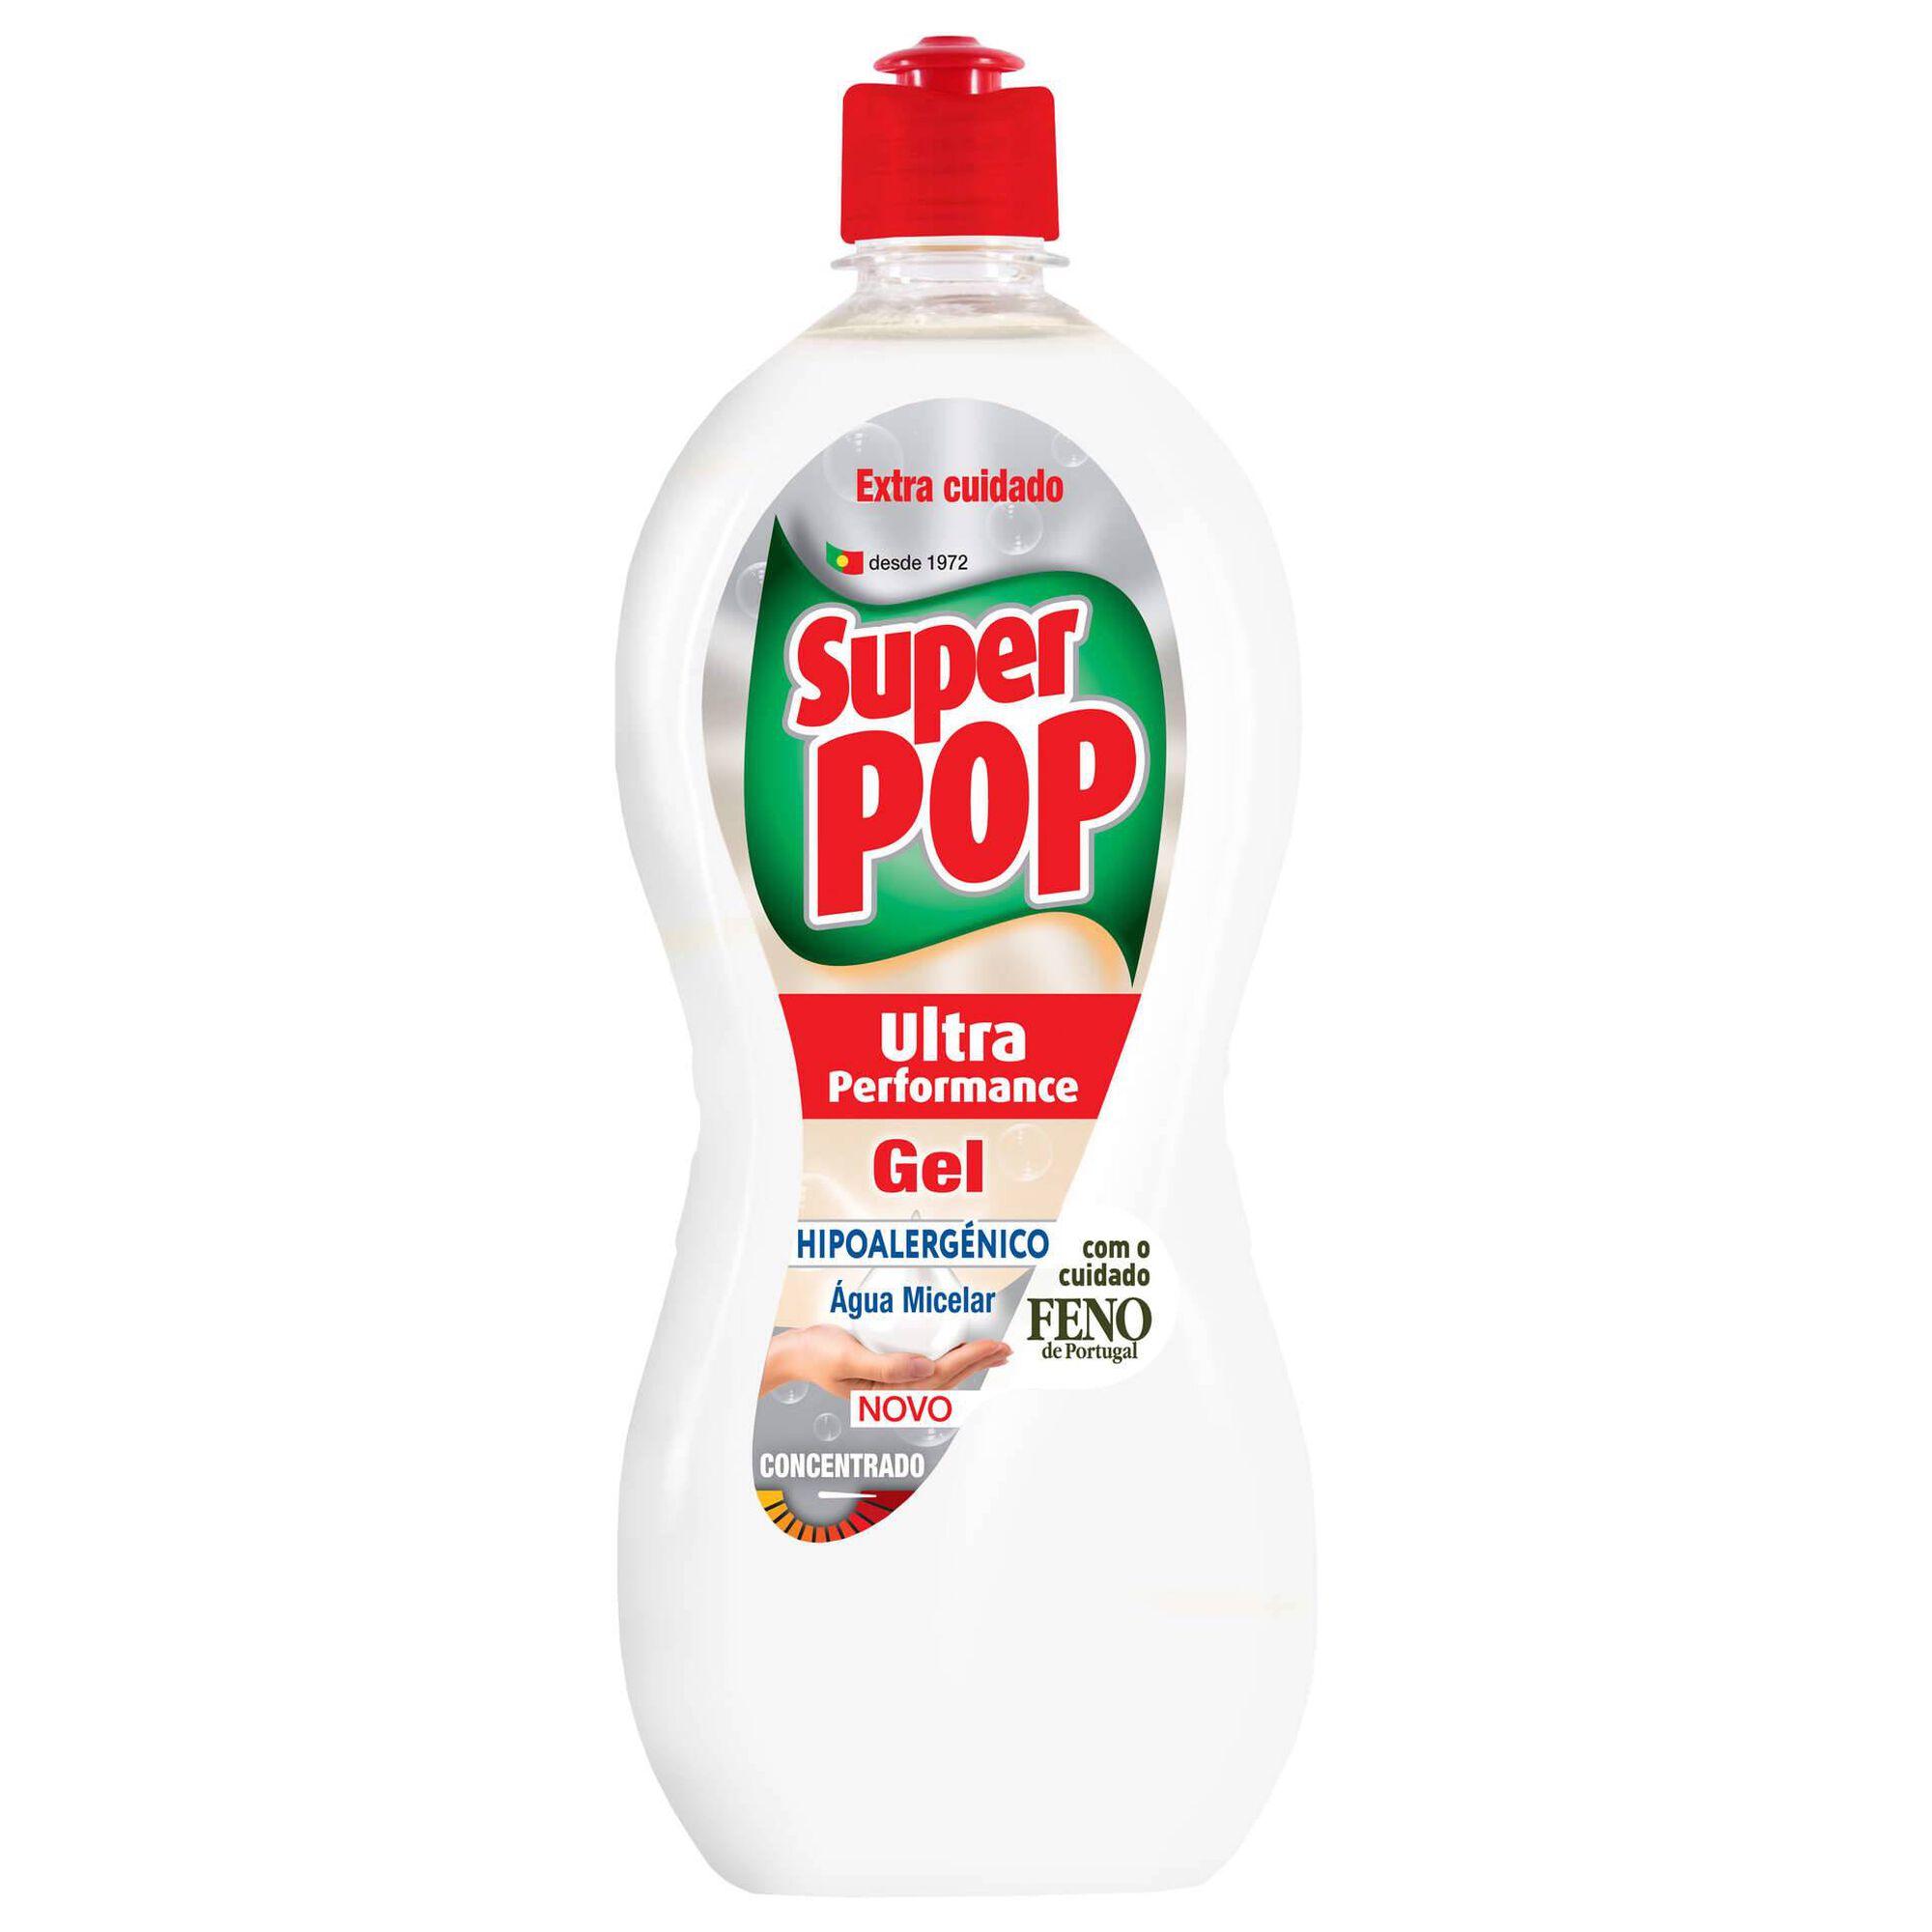 Detergente Manual Loiça Hipoalergénico